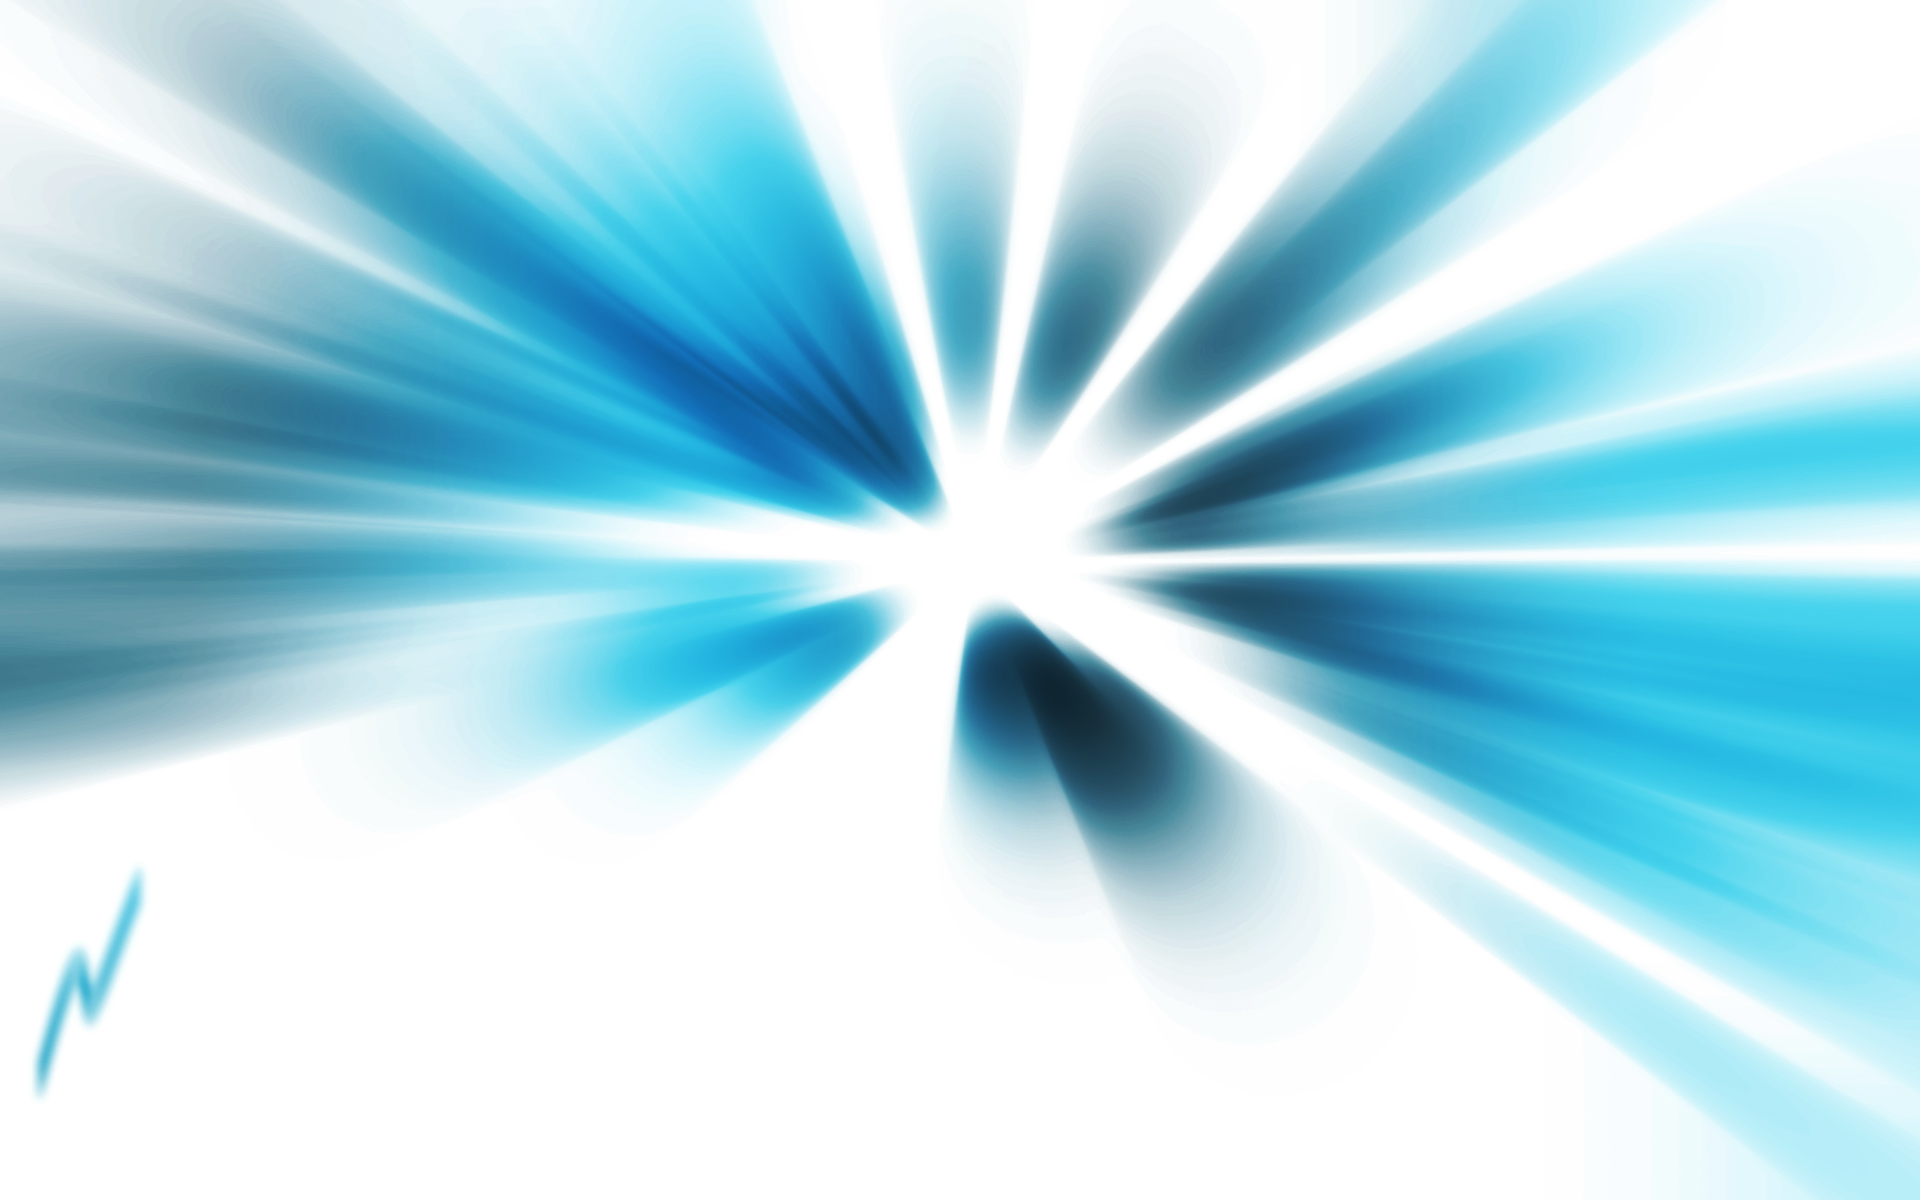 background deep blue v2 by zafzaf customization wallpaper abstract v2 1920x1200